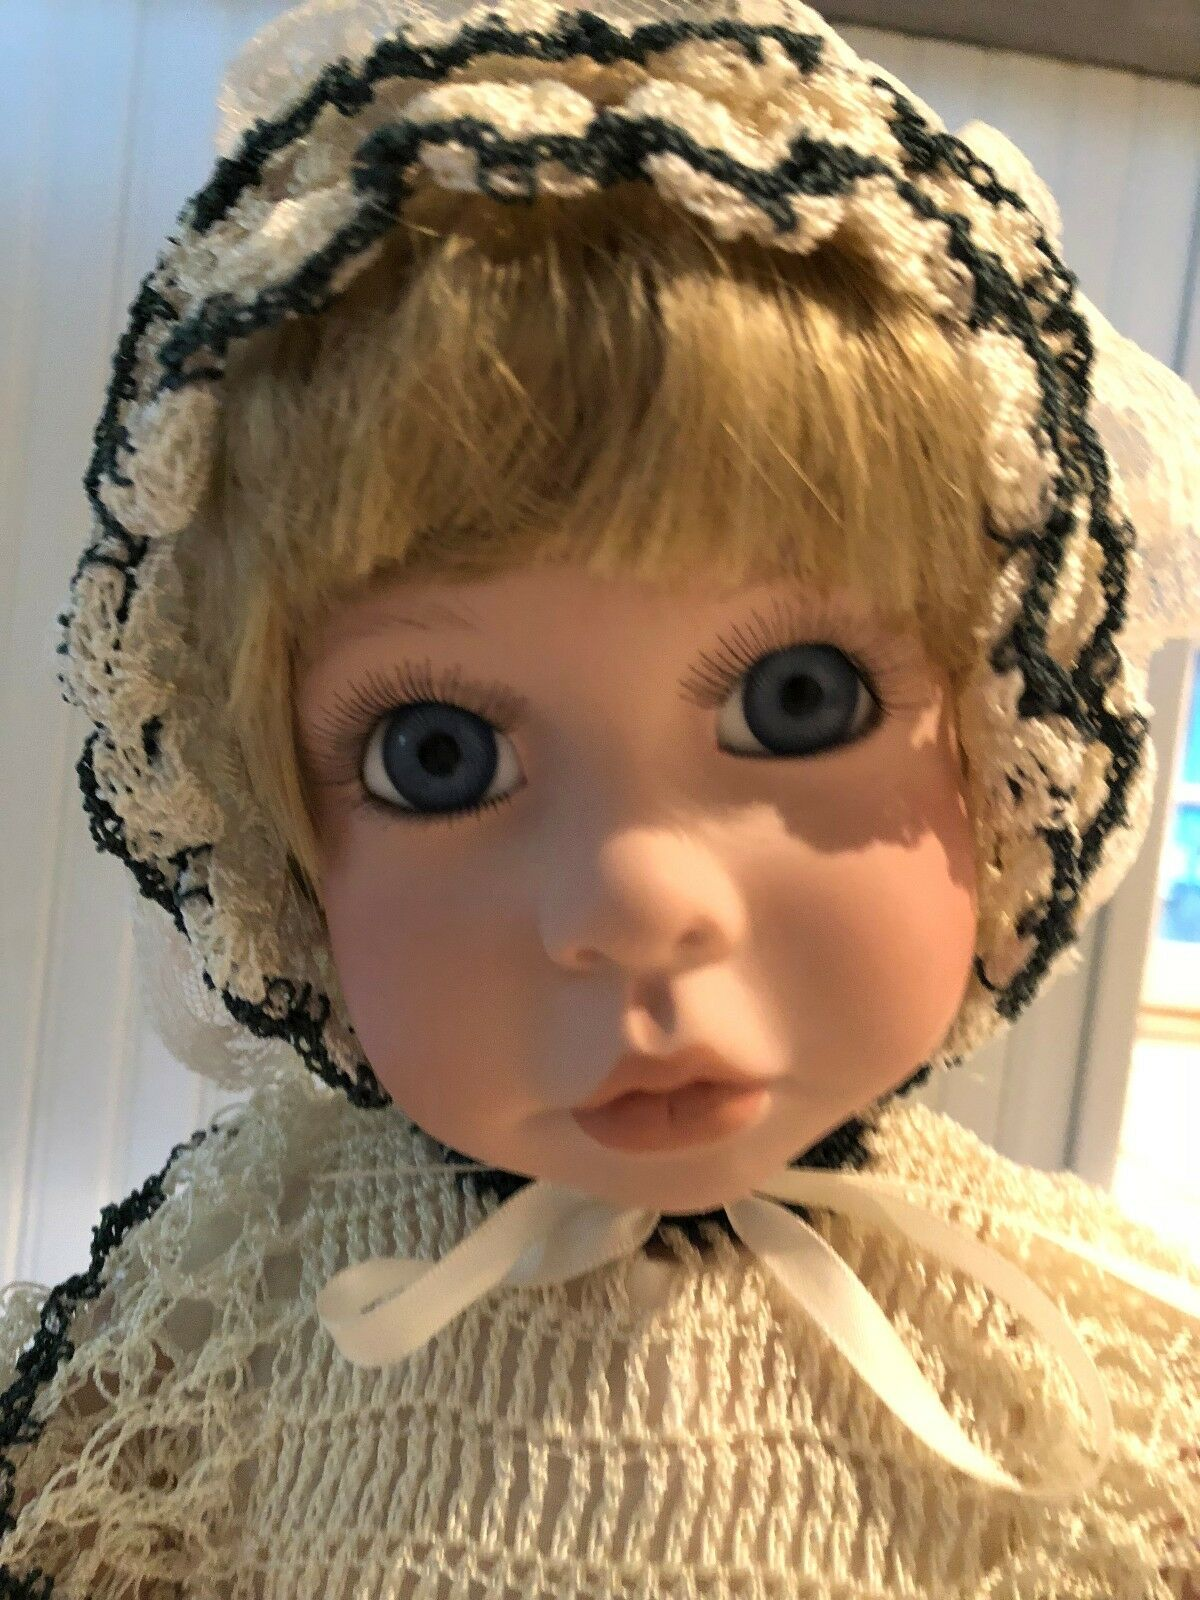 1996 Artist Janis Berard  Janis  Doll by Kias 23 All Porcelain doll